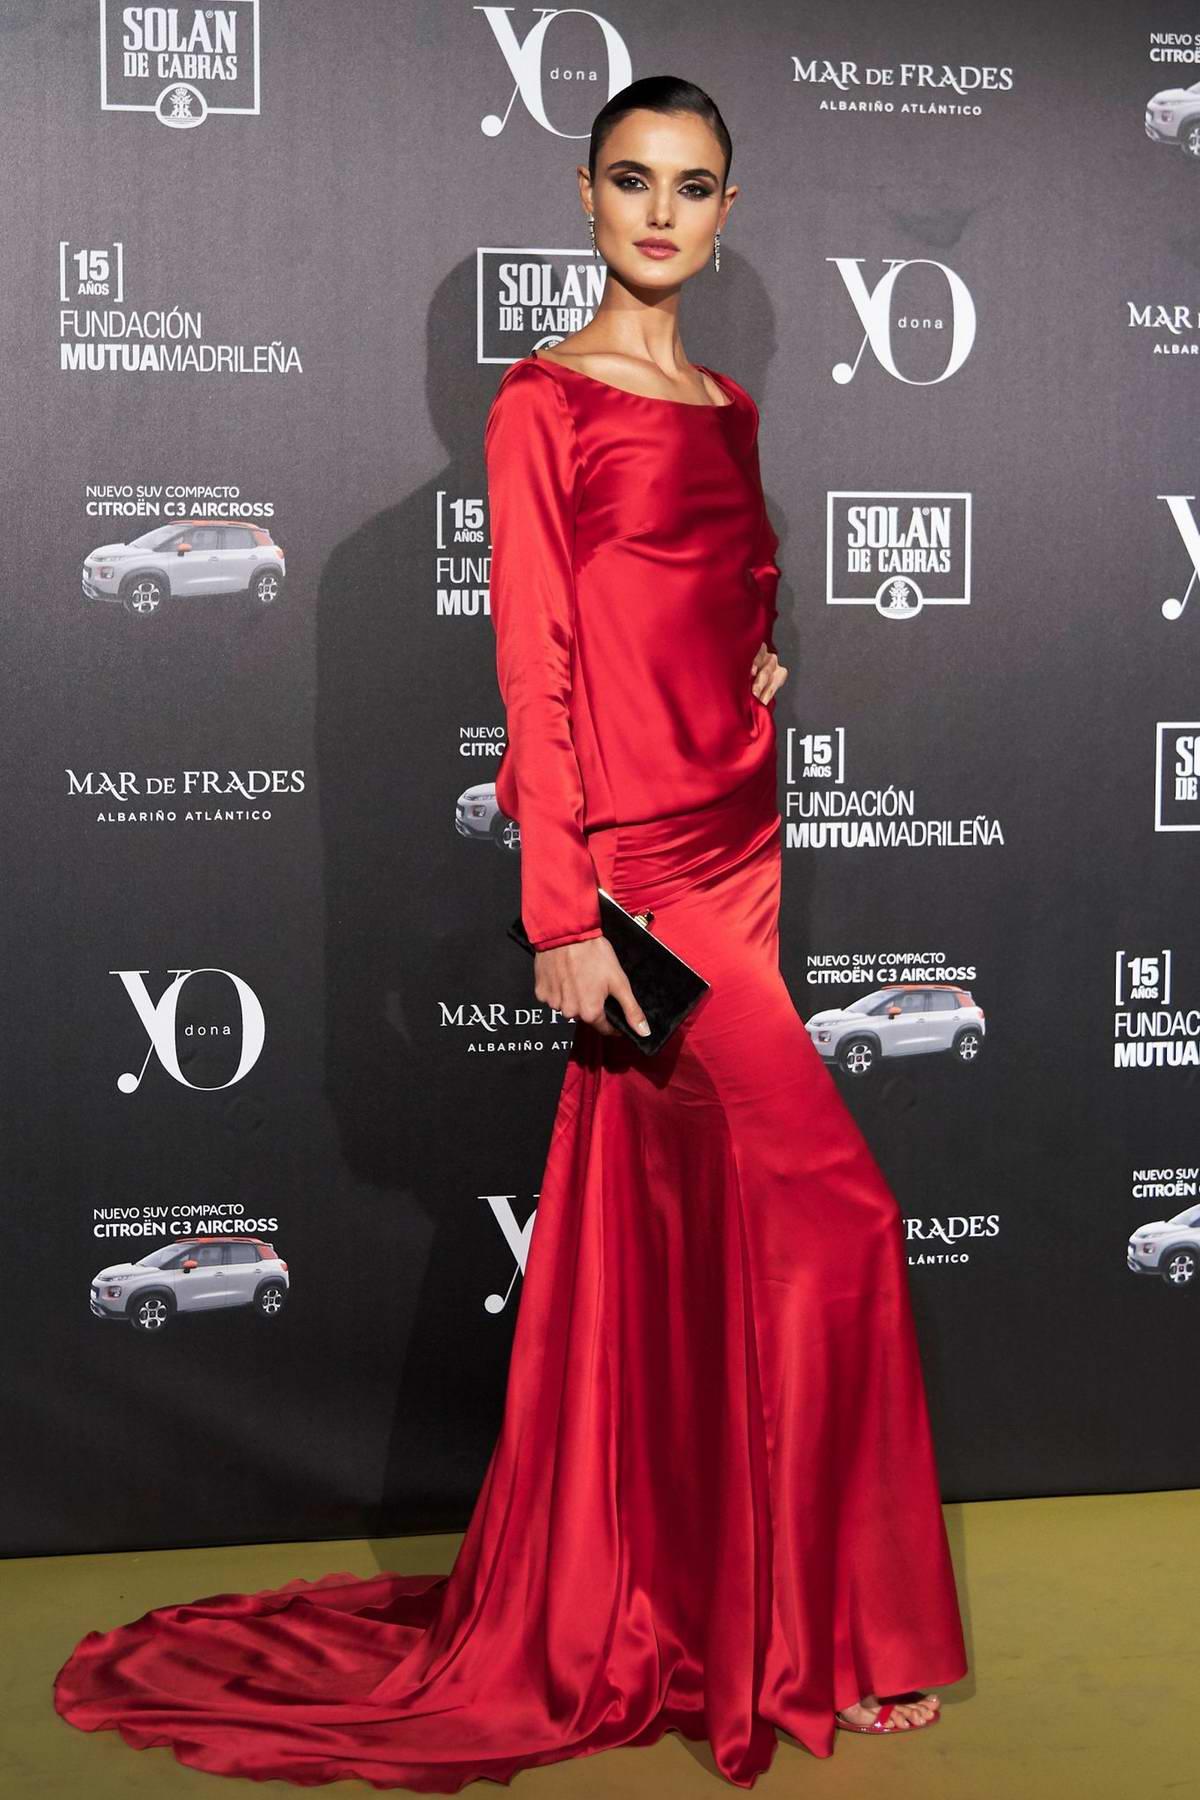 Blanca Padilla attends the 'YO DONA' International Awards 2018 in Madrid, Spain